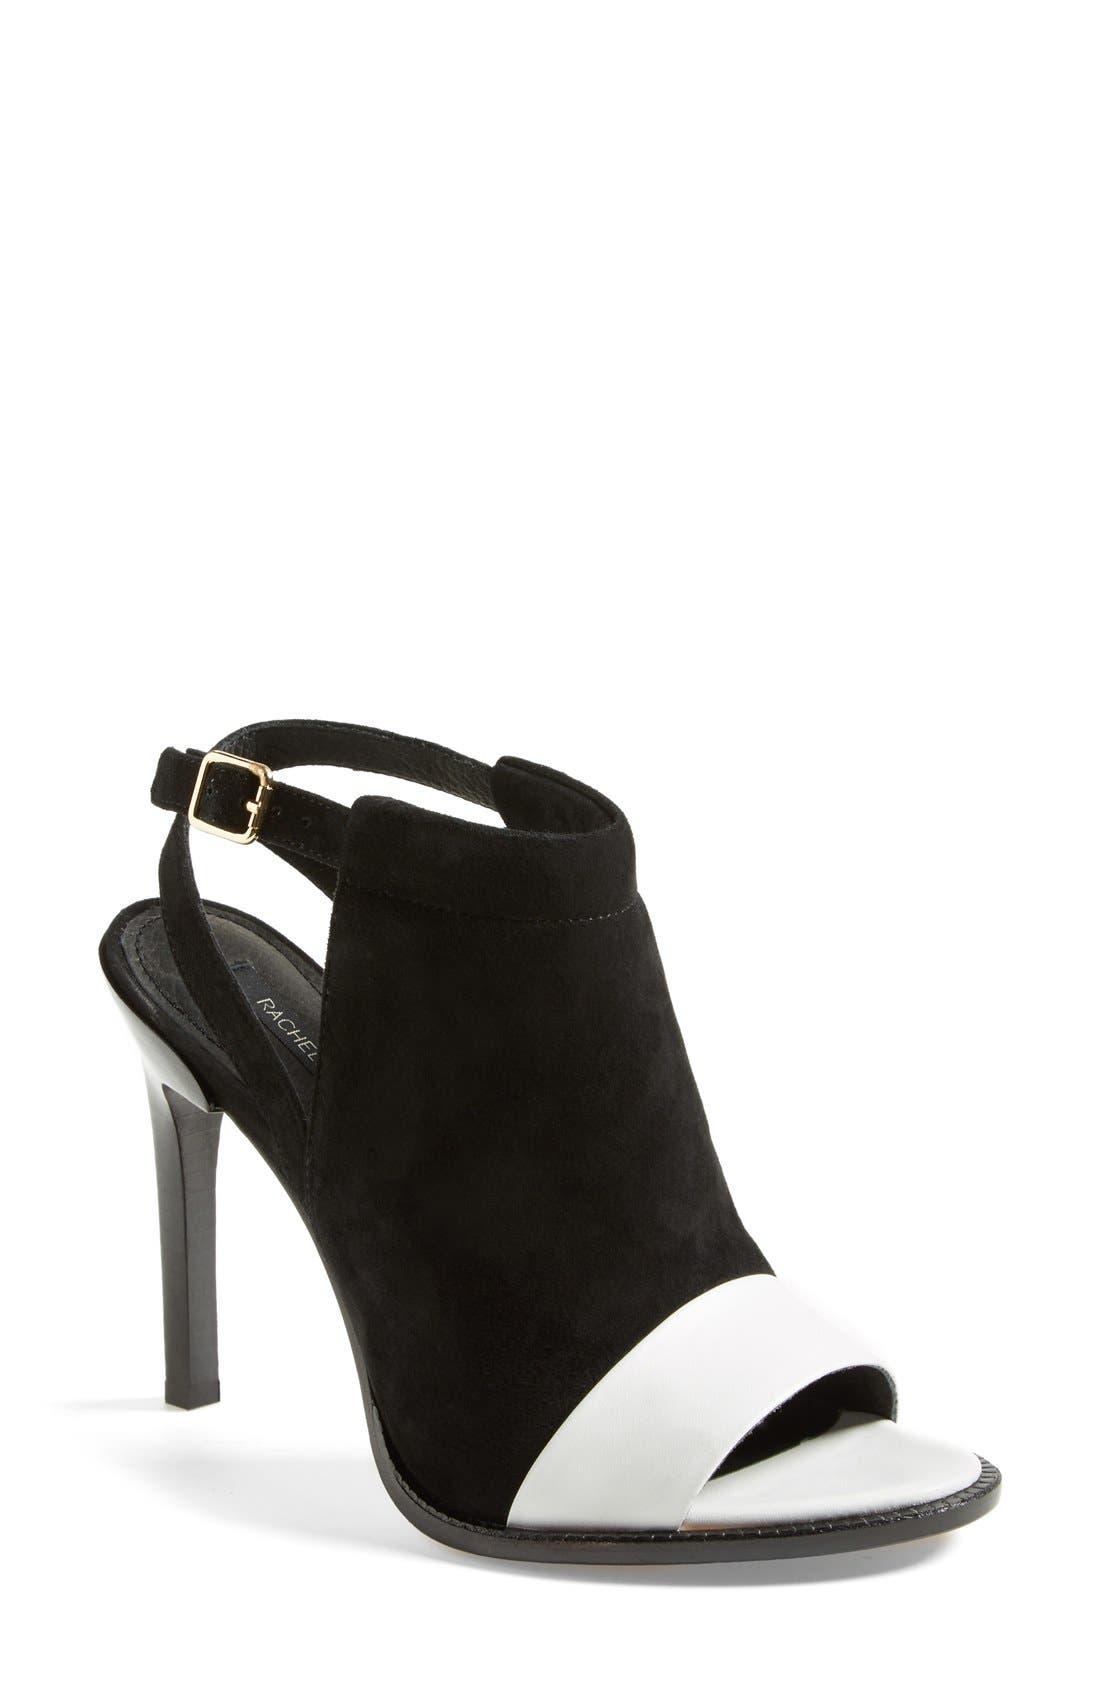 Alternate Image 1 Selected - Rachel Zoe 'Lacey' Sandal (Women)